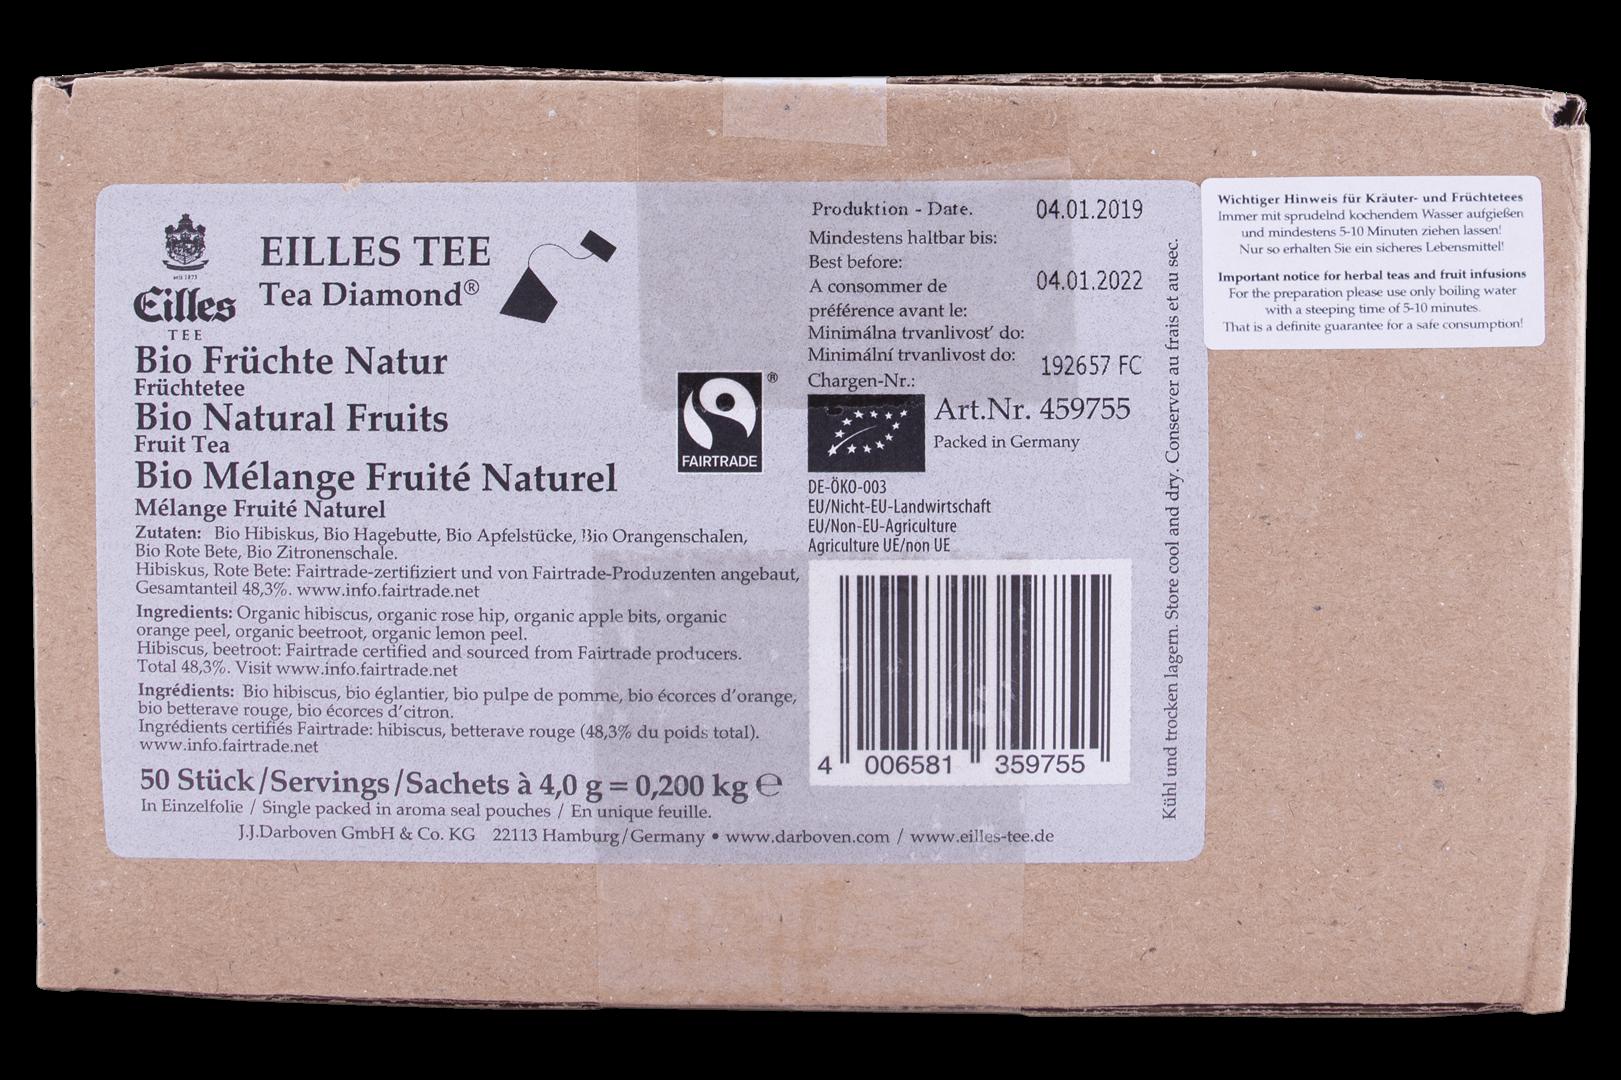 Productafbeelding Eilles Tea Diamonds Bio Fairtrade Natural Fruits geënveloppeerd